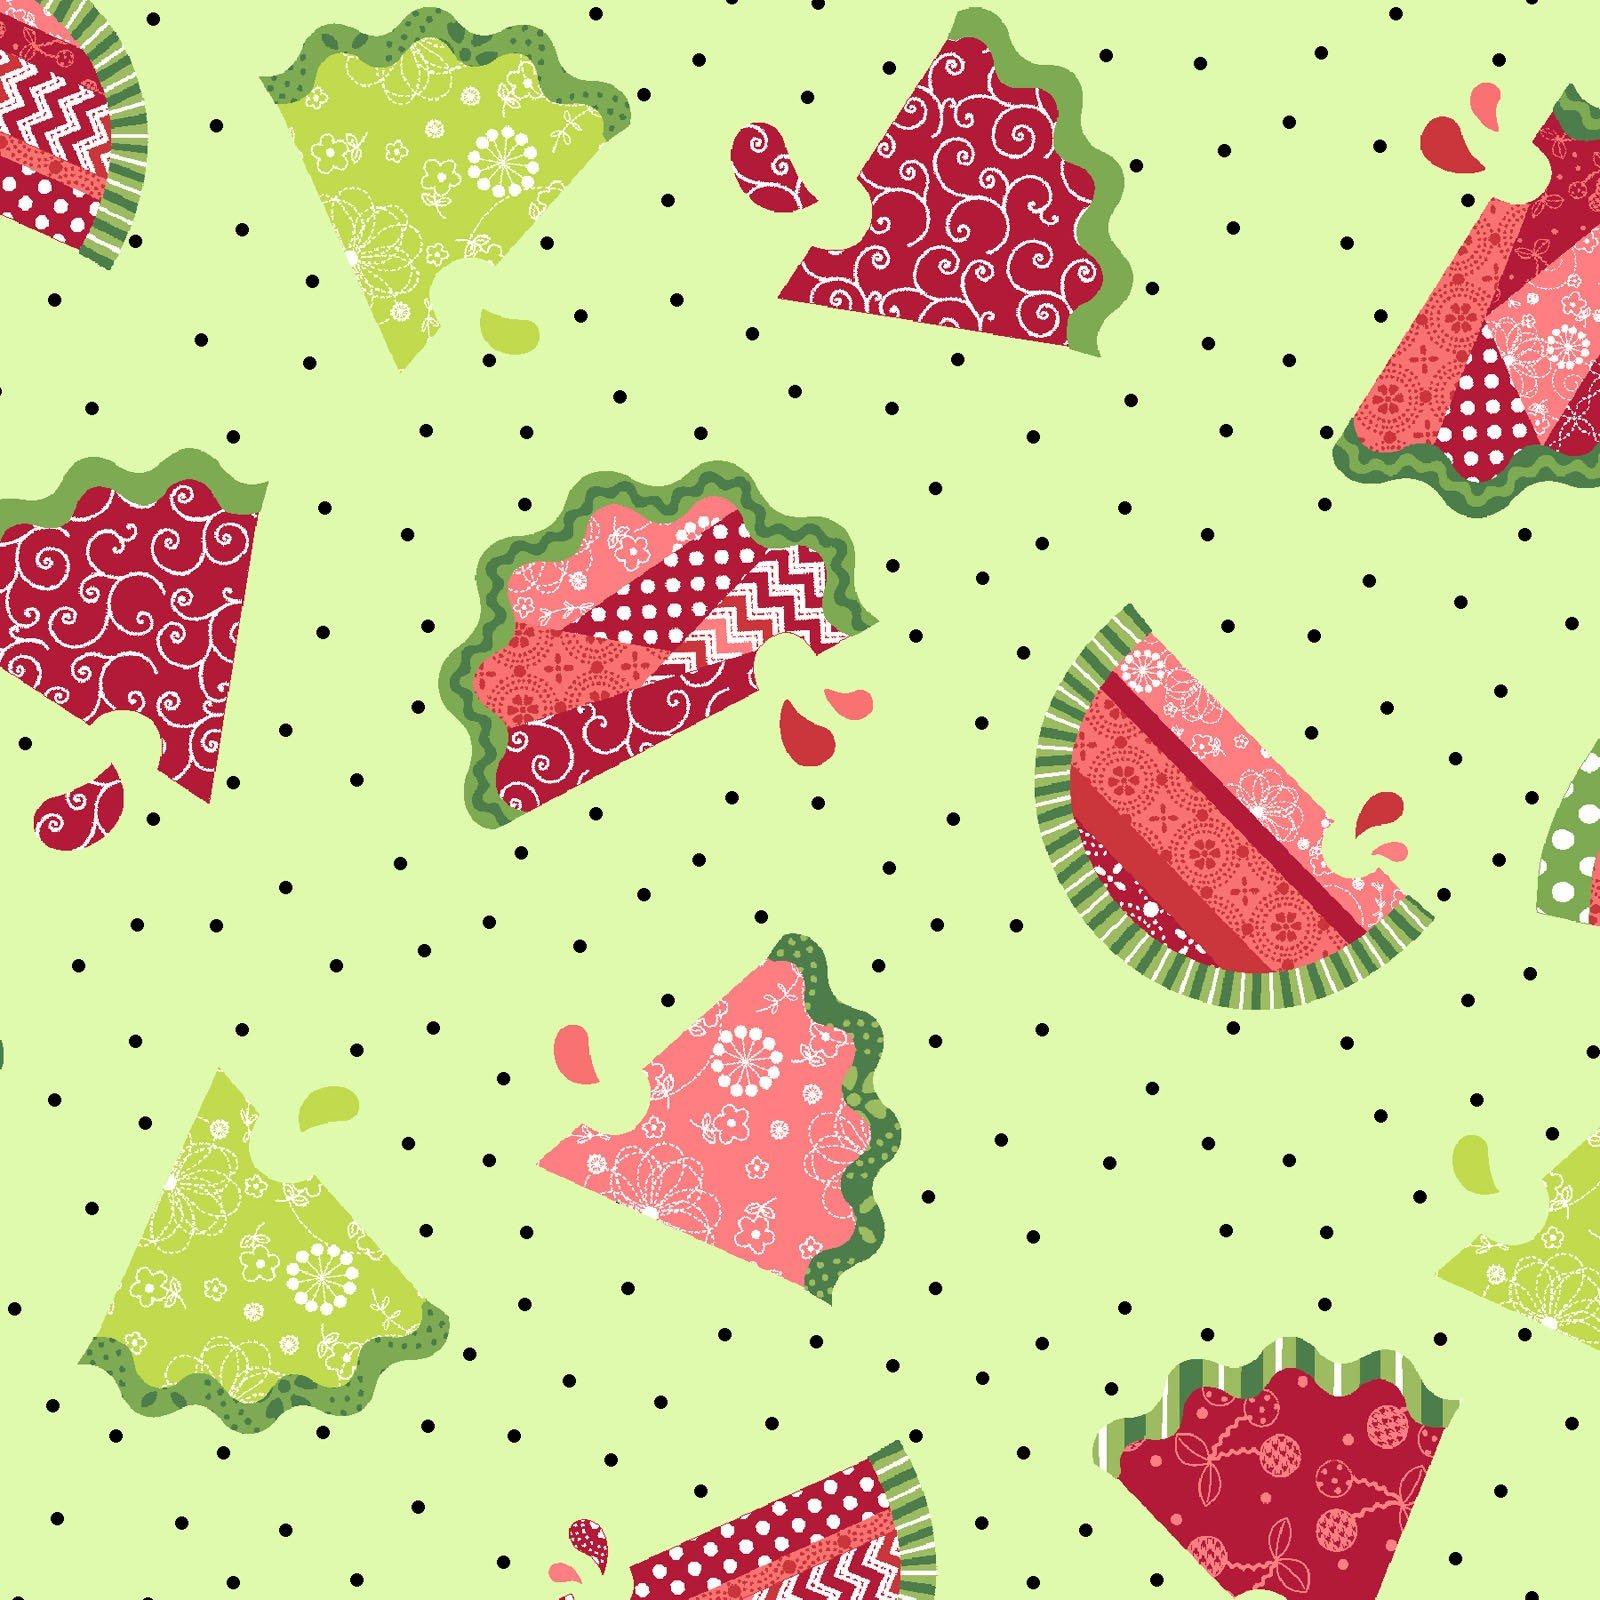 Sprinkle Sunshine-Watermelons on green